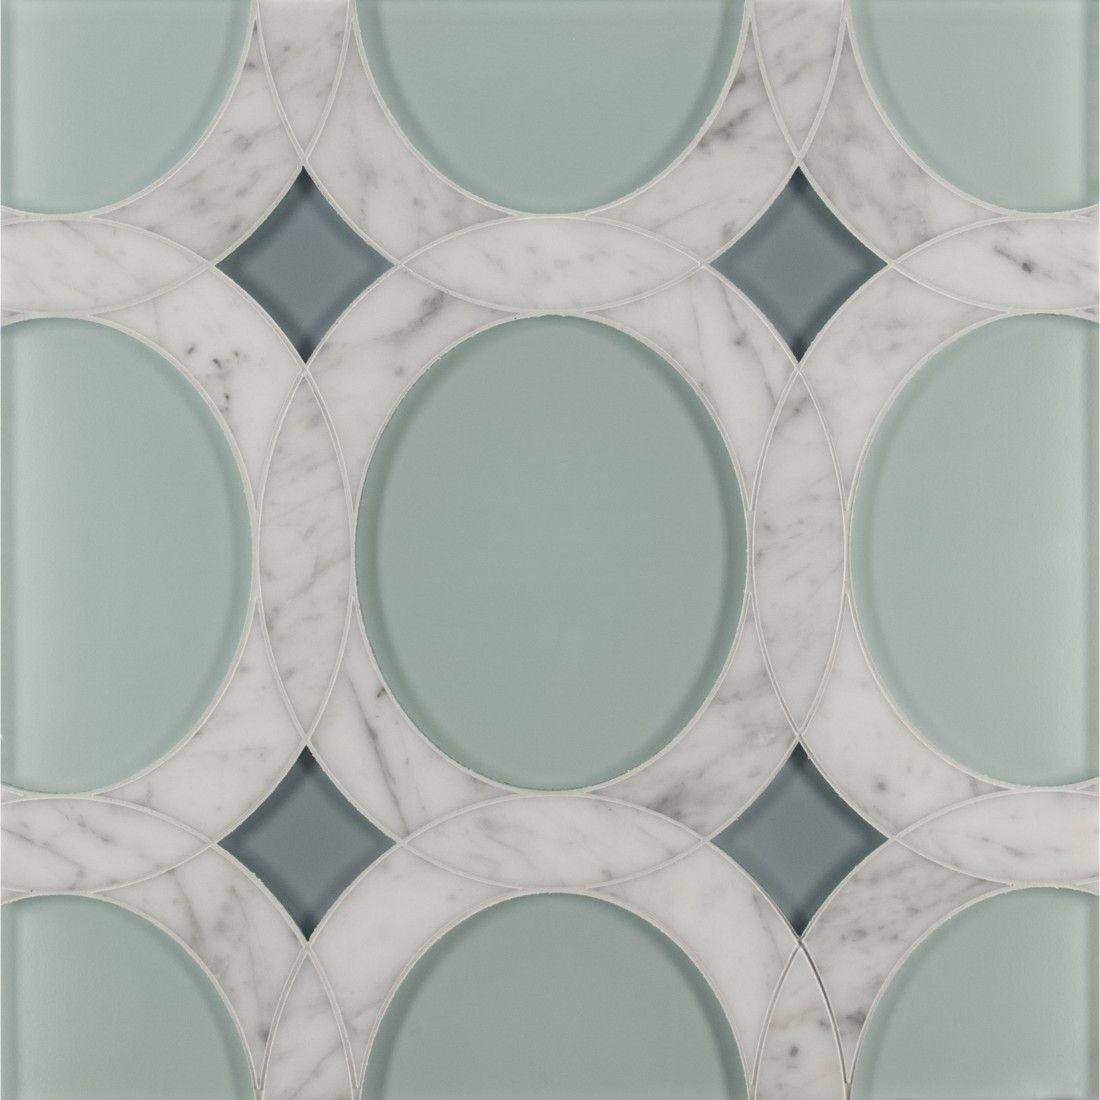 Liberty Mosaics Ann Sacks Tile Stone Rockefeller Oval Medium Mosaic In Aquamarine Blue Clear Gl Abalone And Bianco Carrera Marble